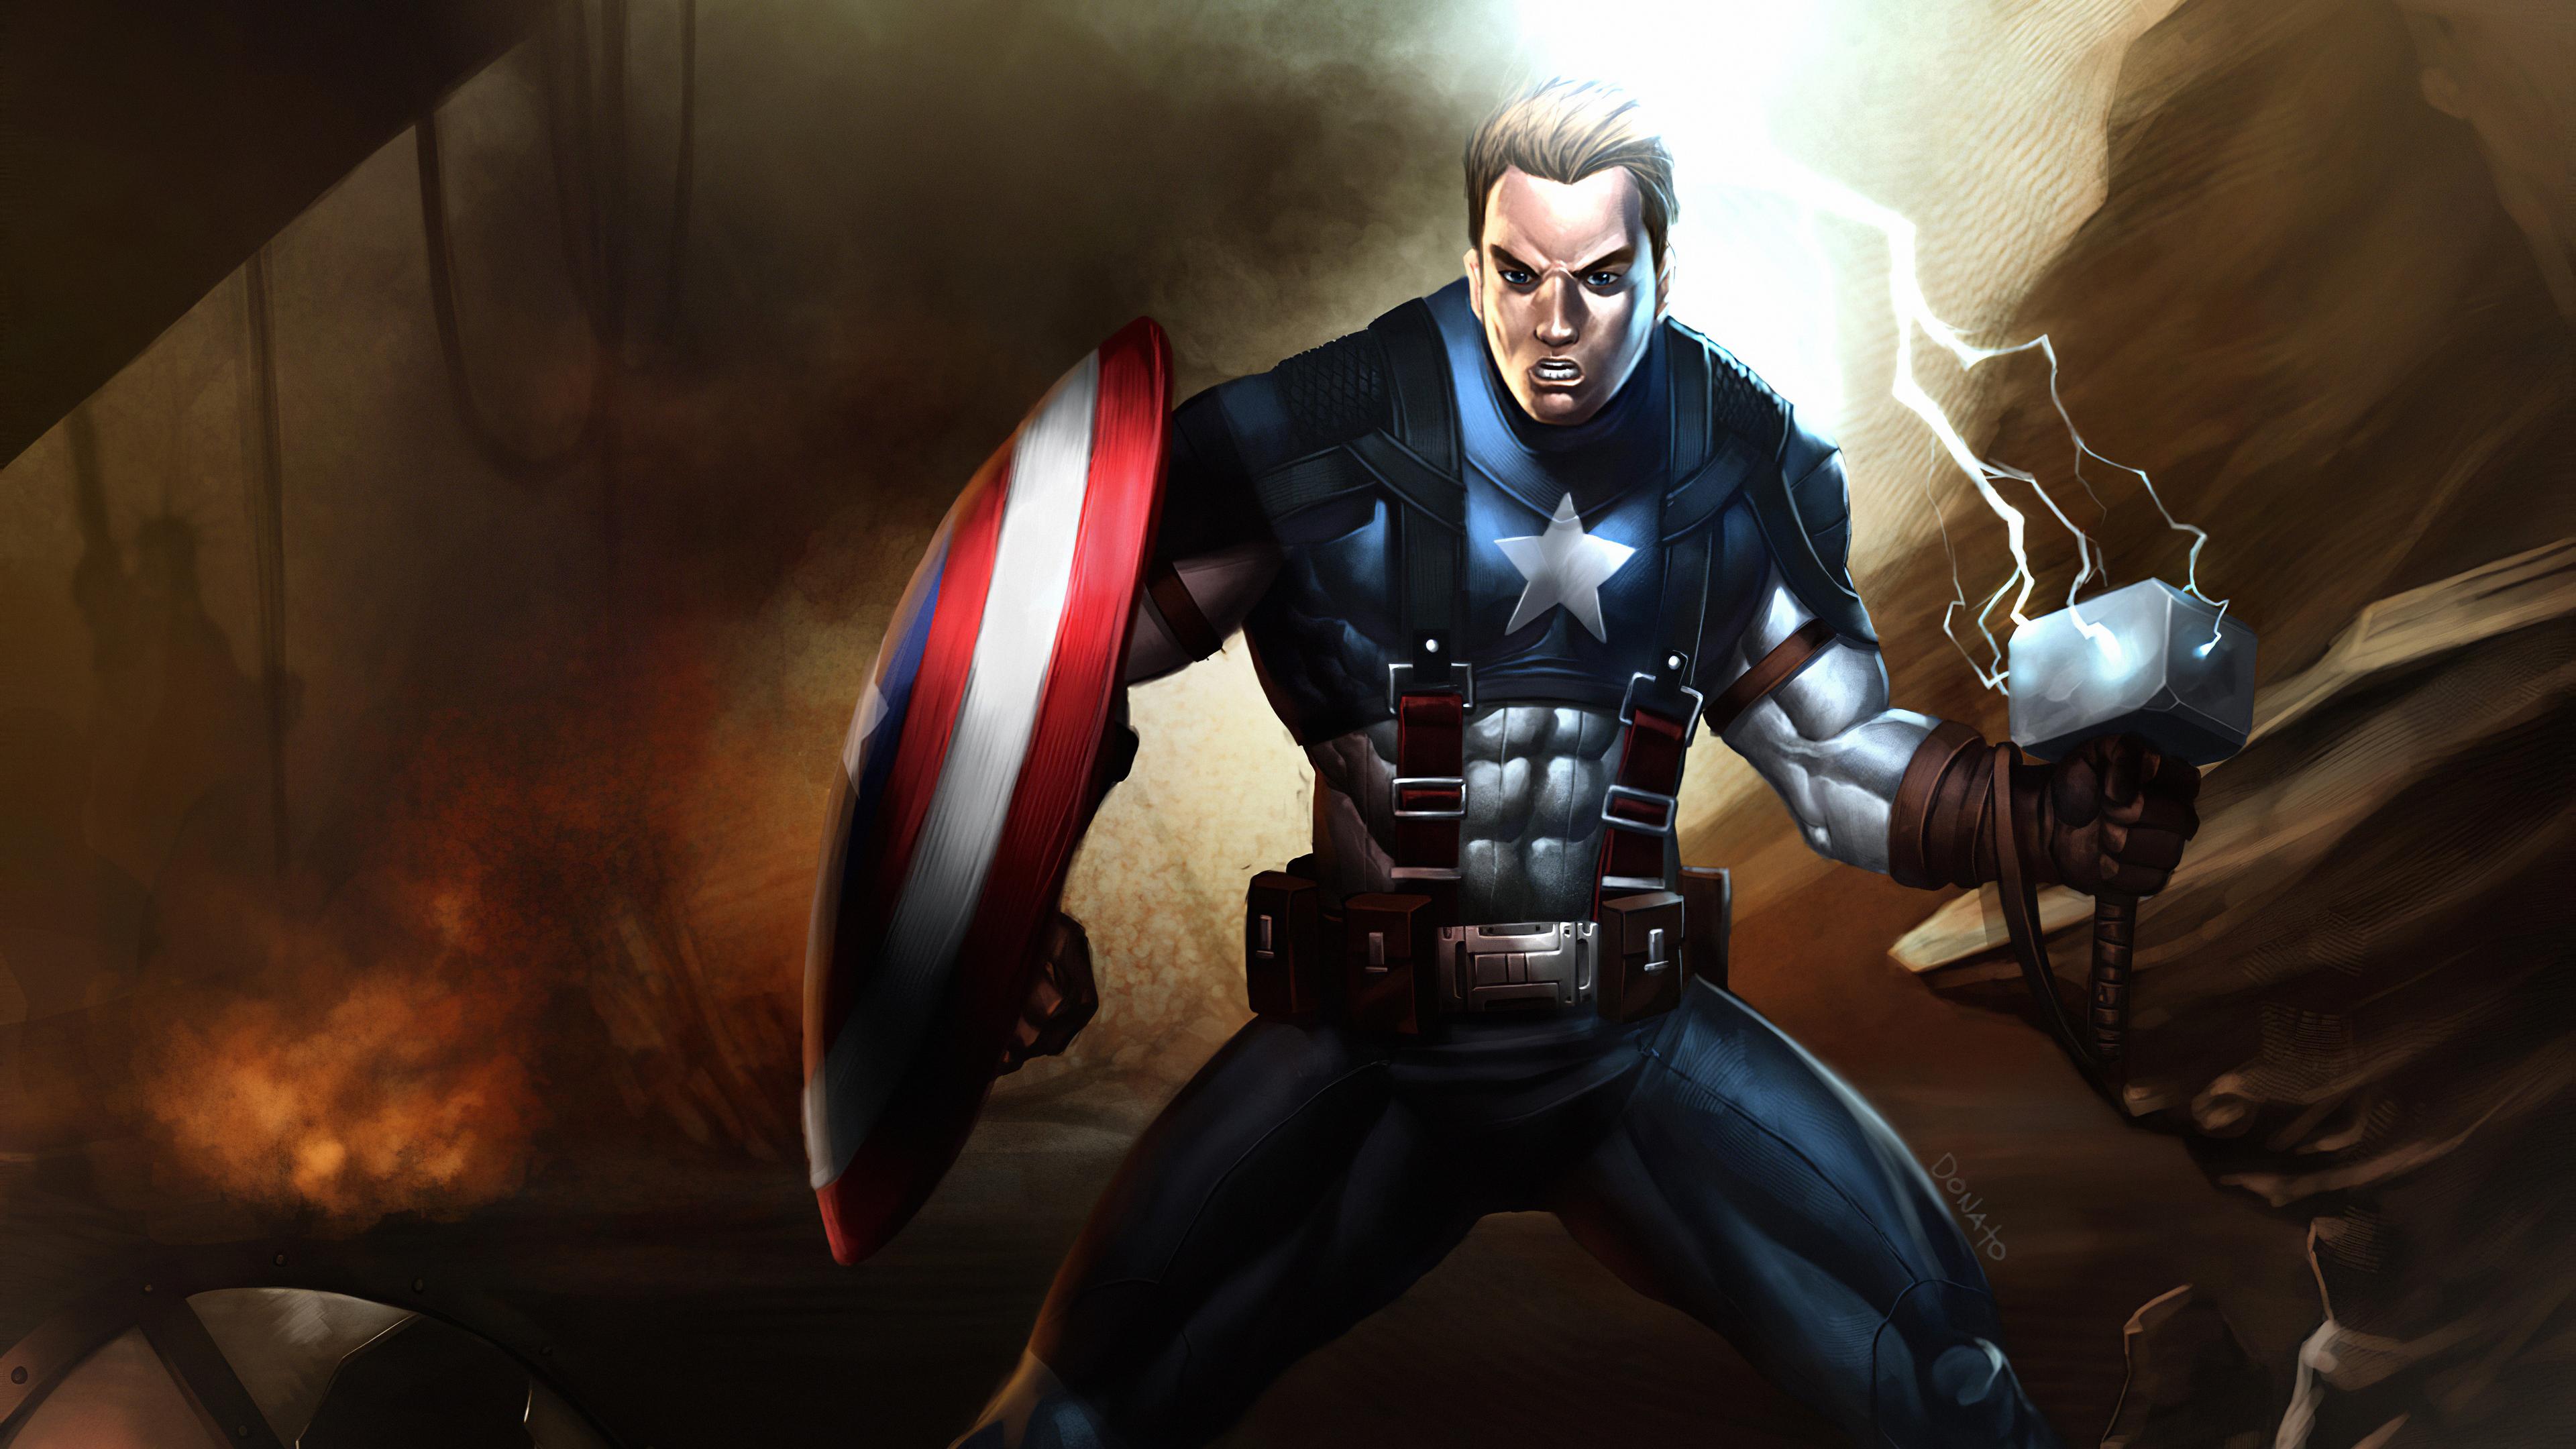 captain america shield hammer 1572368585 - Captain America Shield Hammer - superheroes wallpapers, hd-wallpapers, digital art wallpapers, deviantart wallpapers, captain america wallpapers, artwork wallpapers, artist wallpapers, 4k-wallpapers